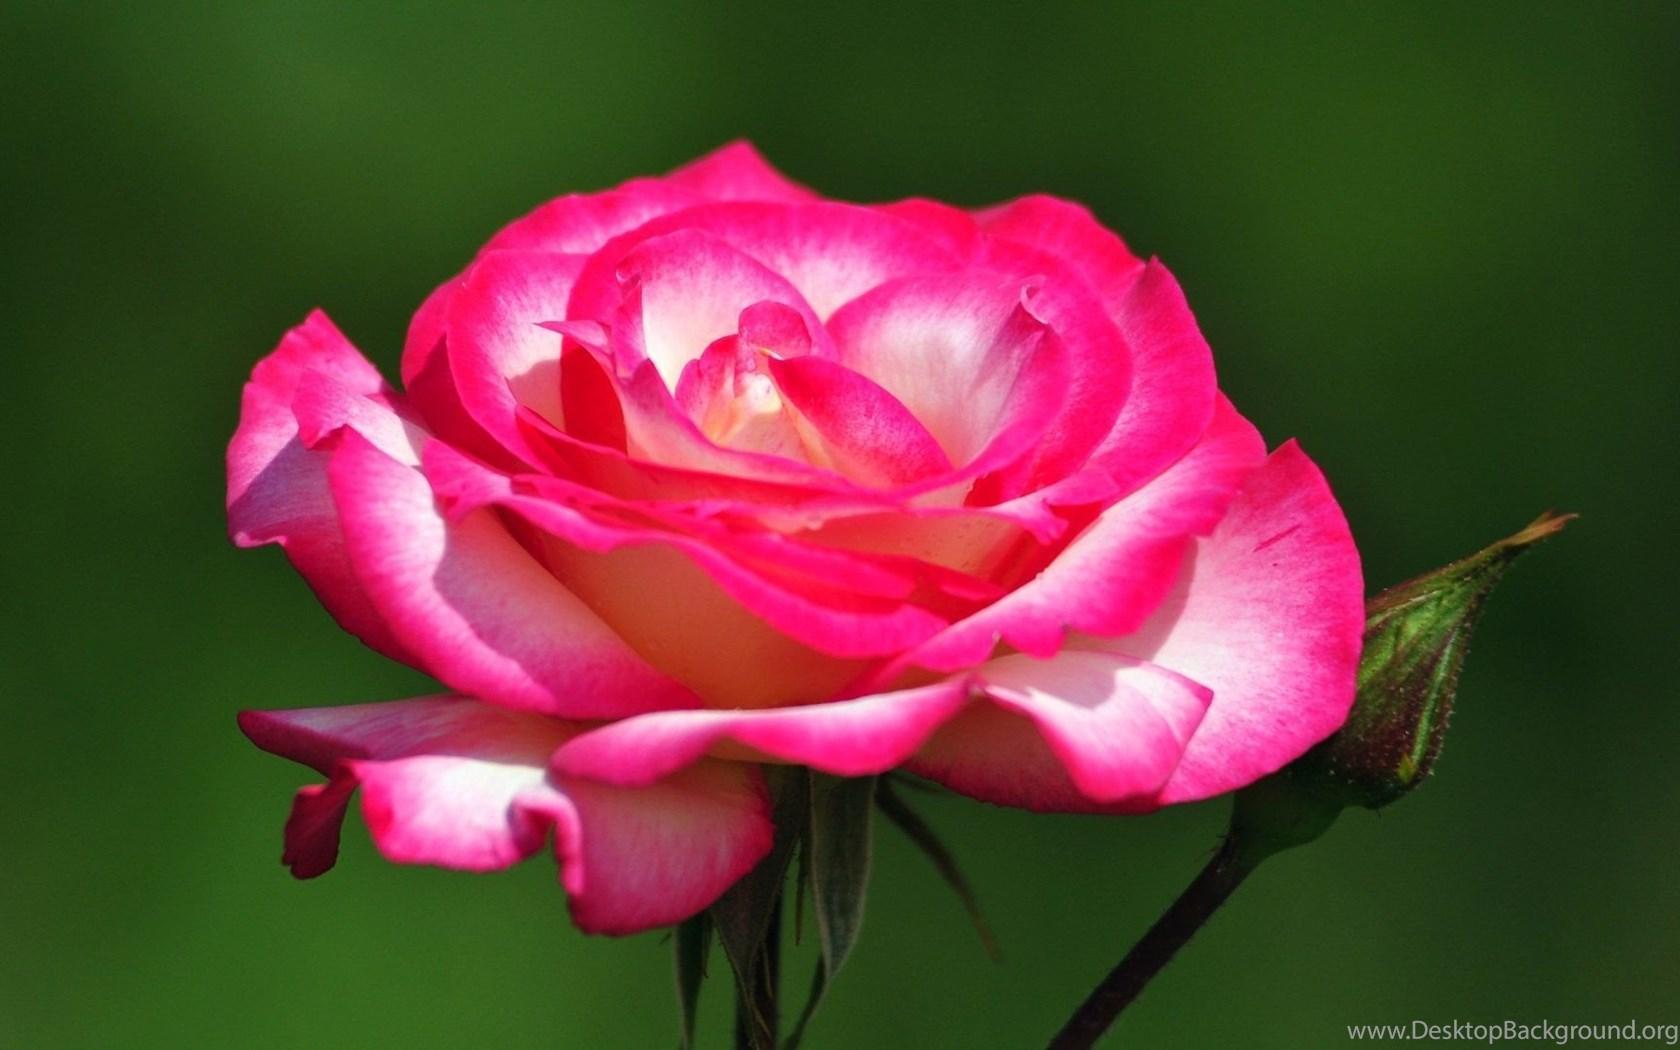 Beautiful Rose Flower Wallpapers Wallpapers Hd Wide Desktop Background